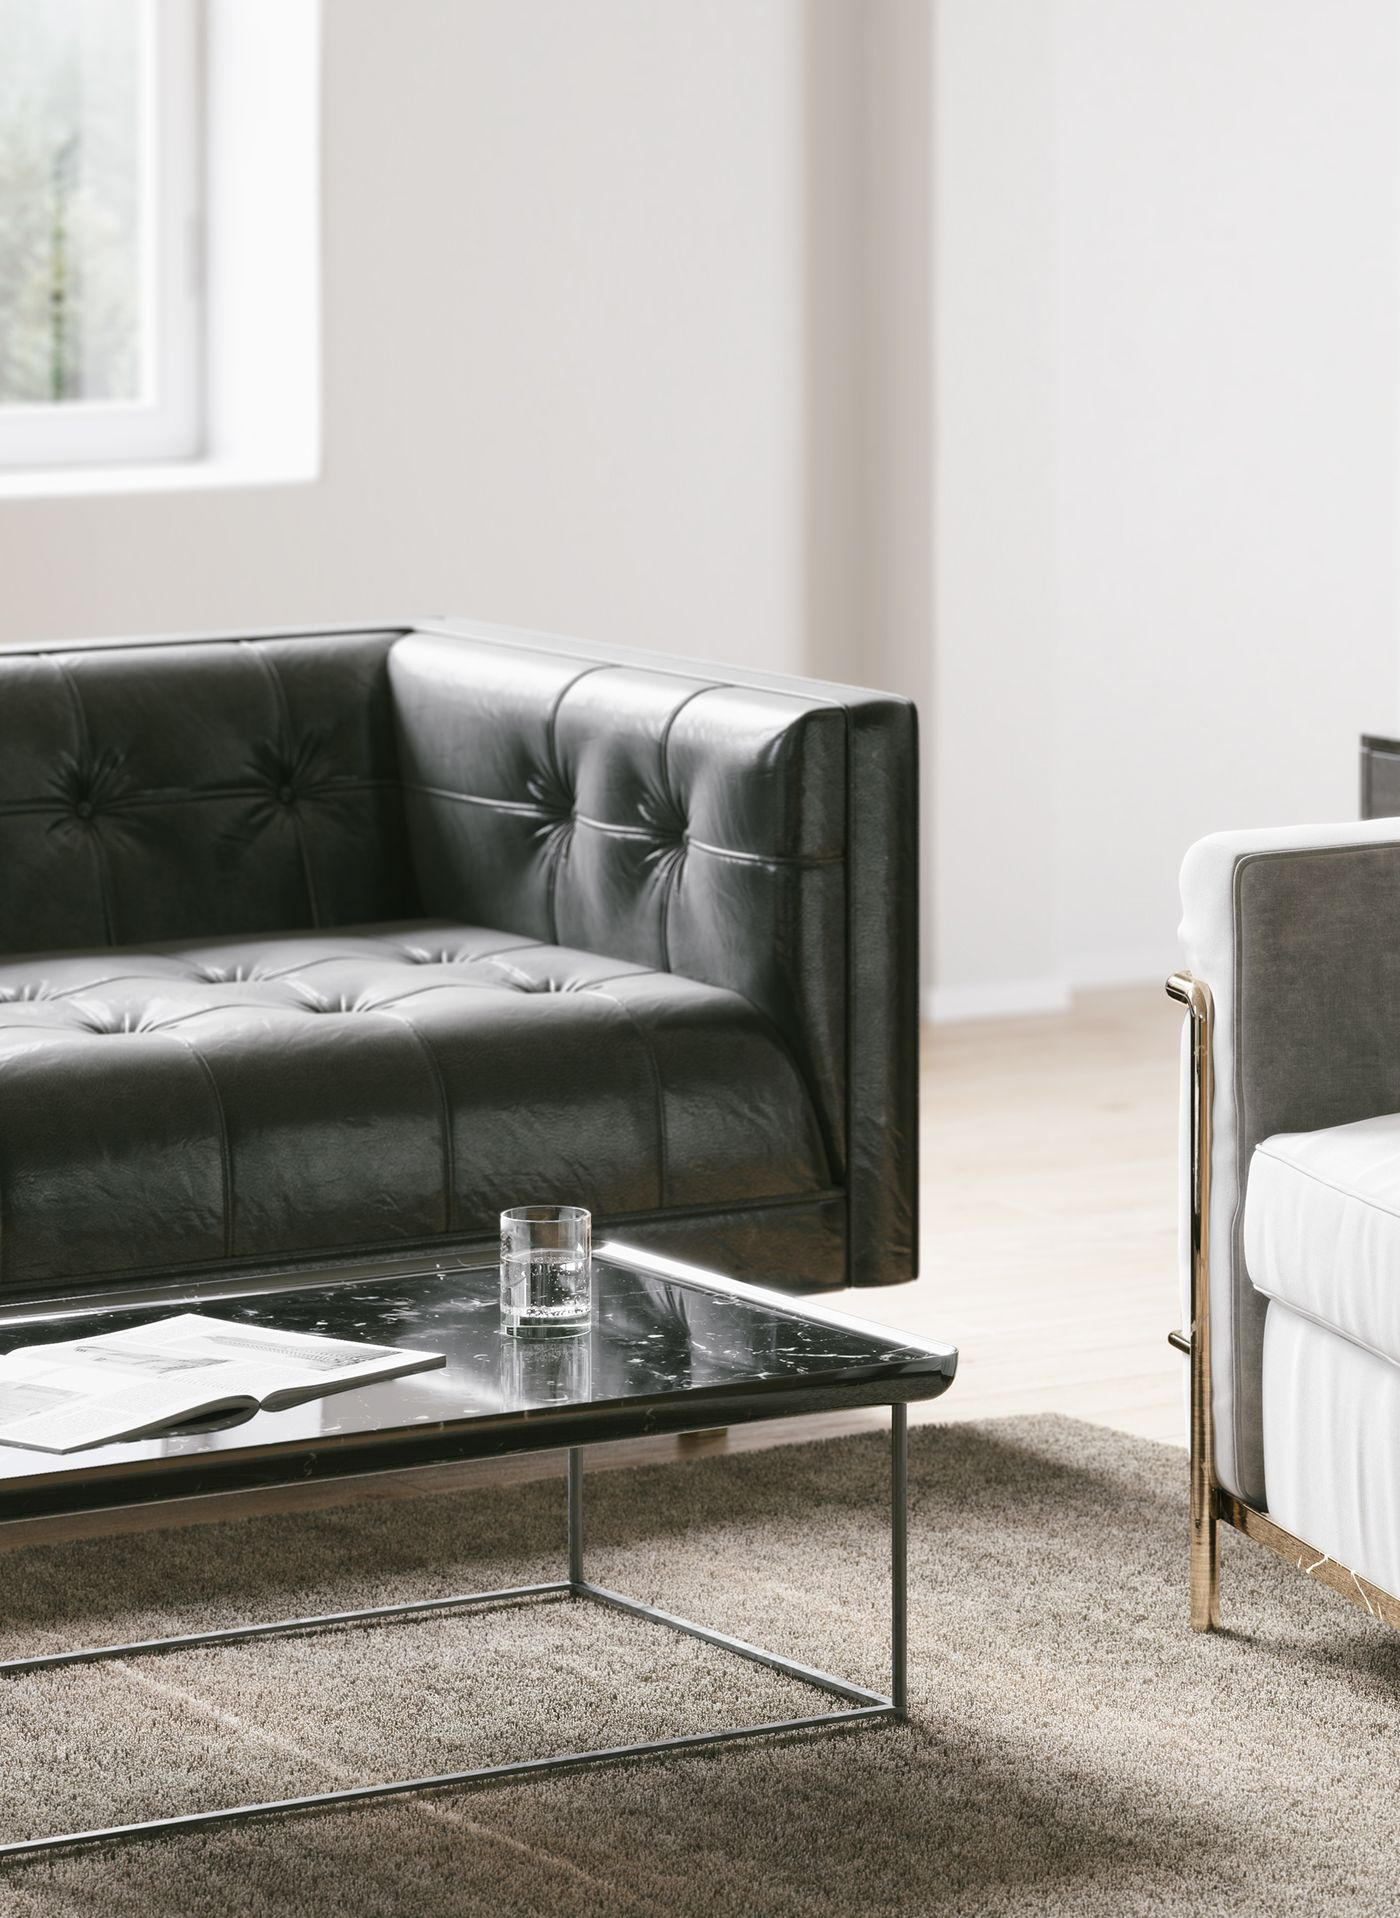 Autodesk Room Design: Living Room Side Table, 3d